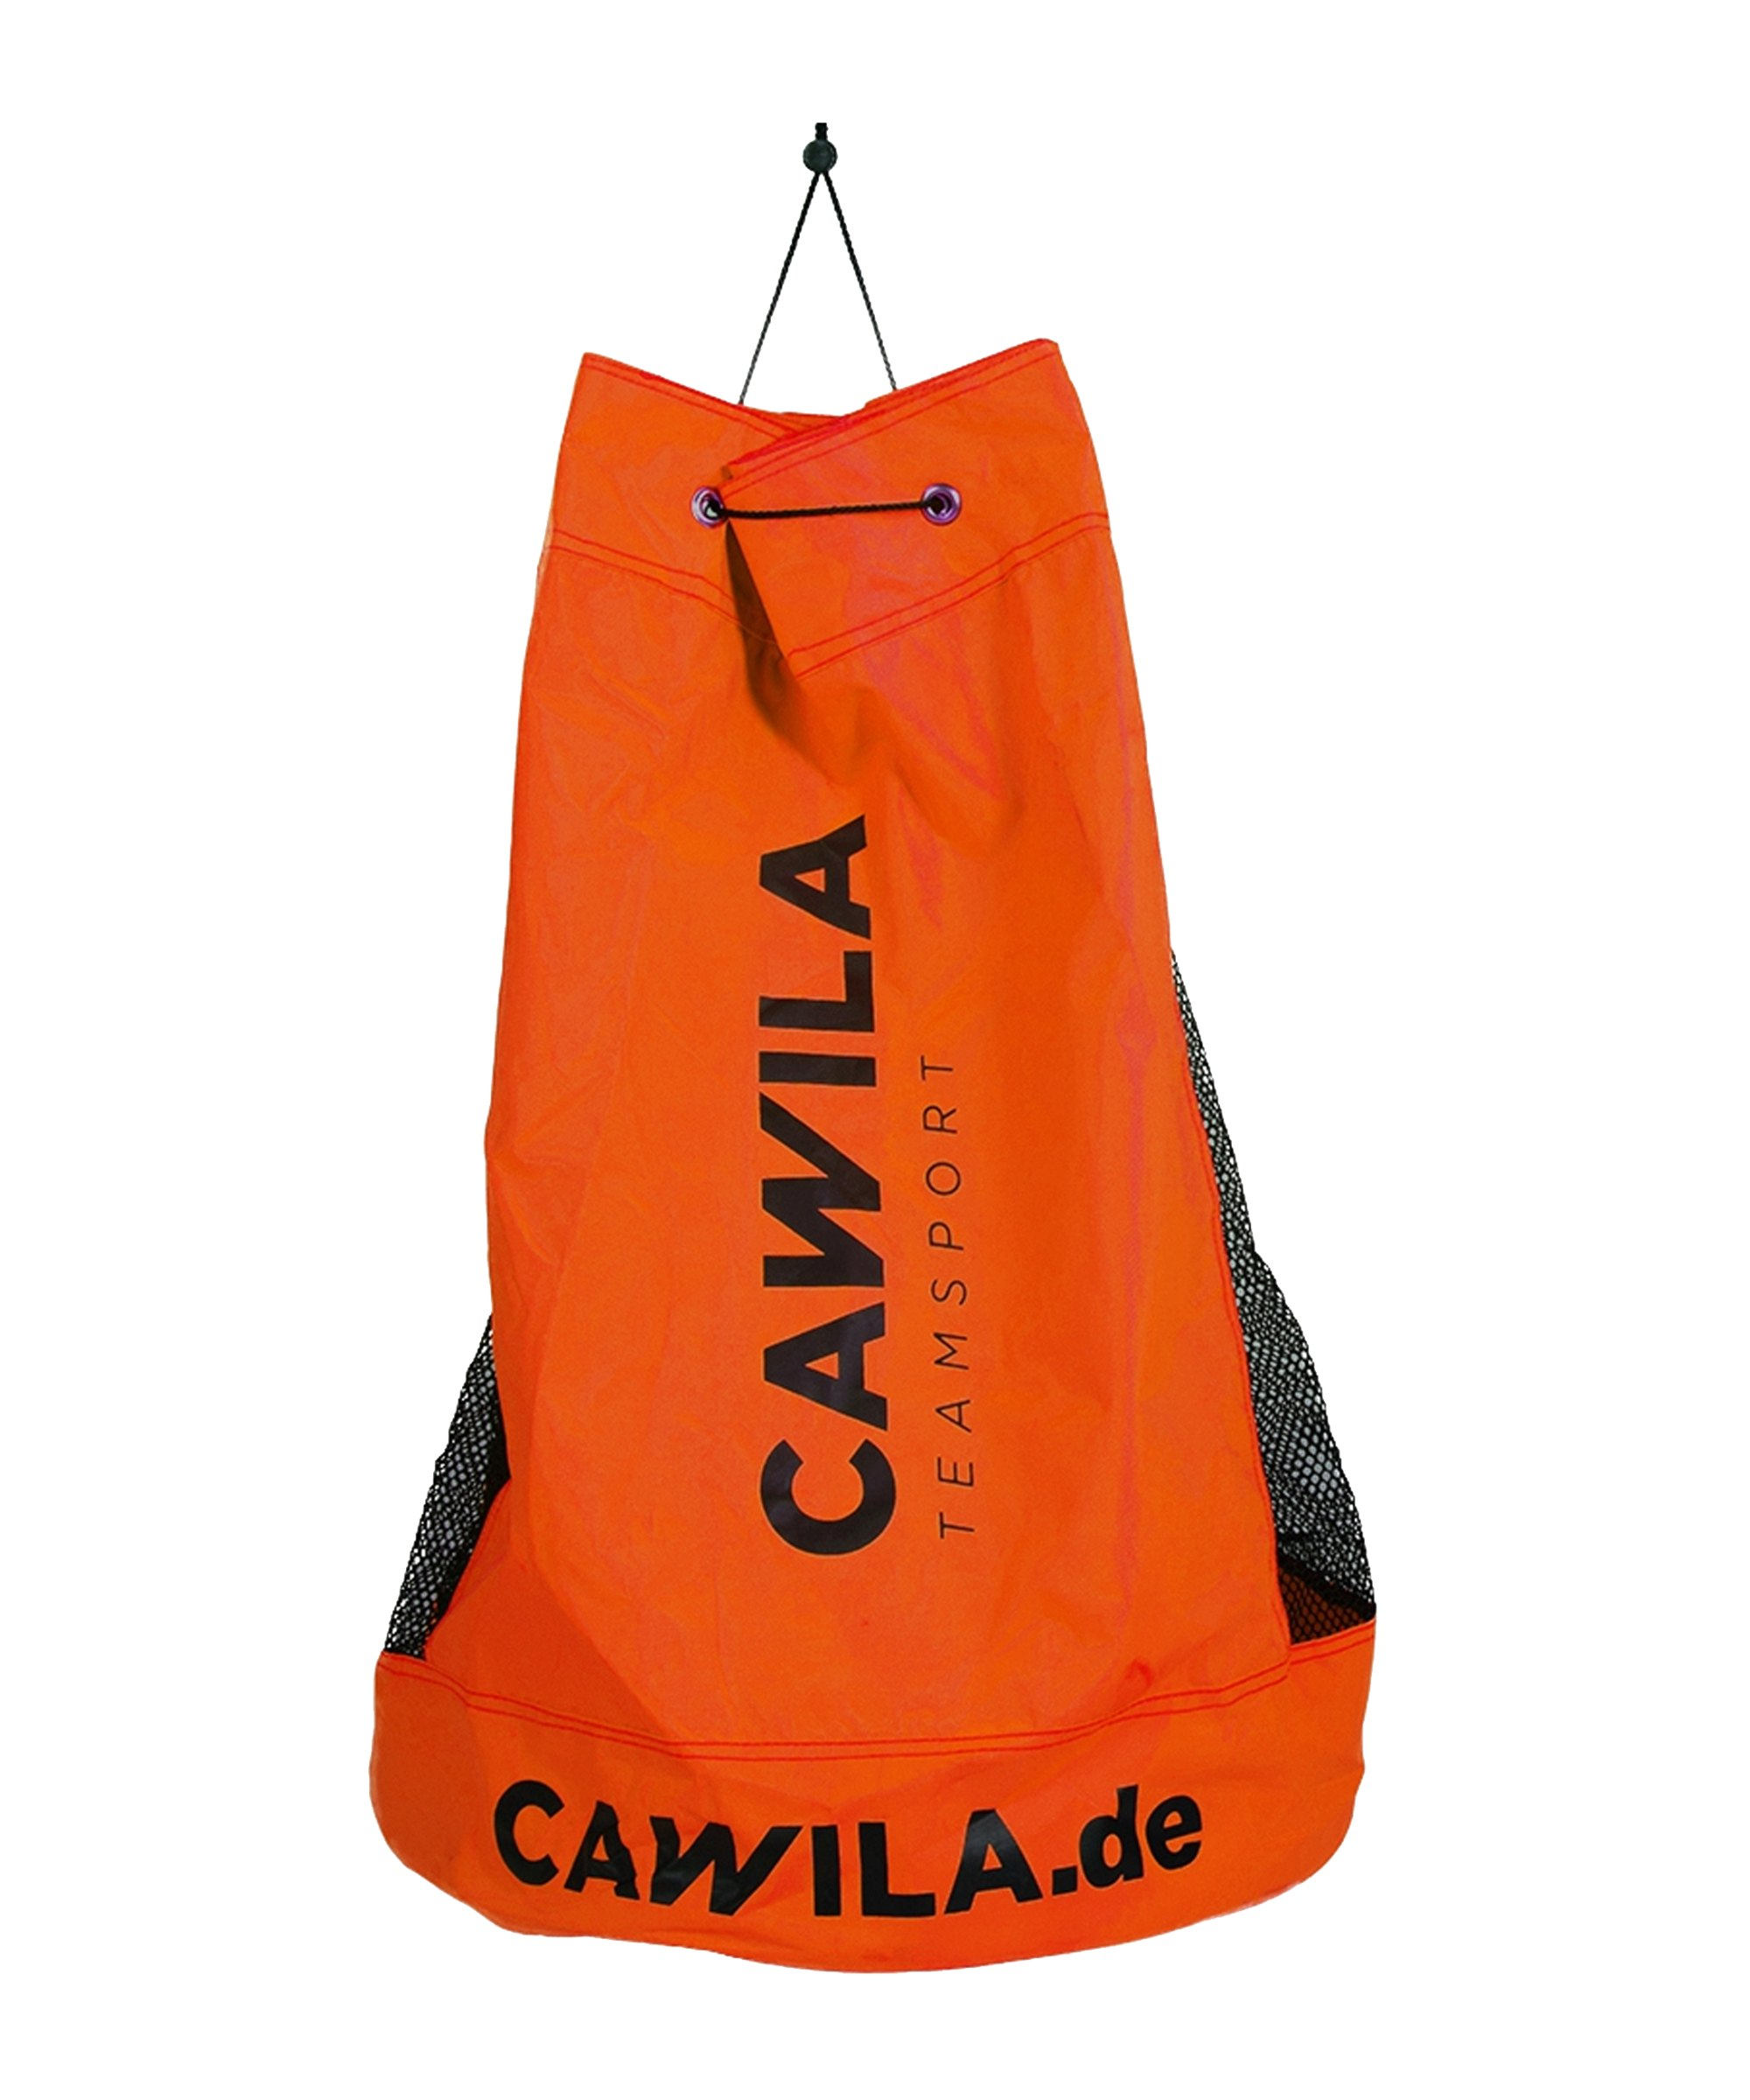 Cawila Ballsack 12 Fussbälle Orange - orange